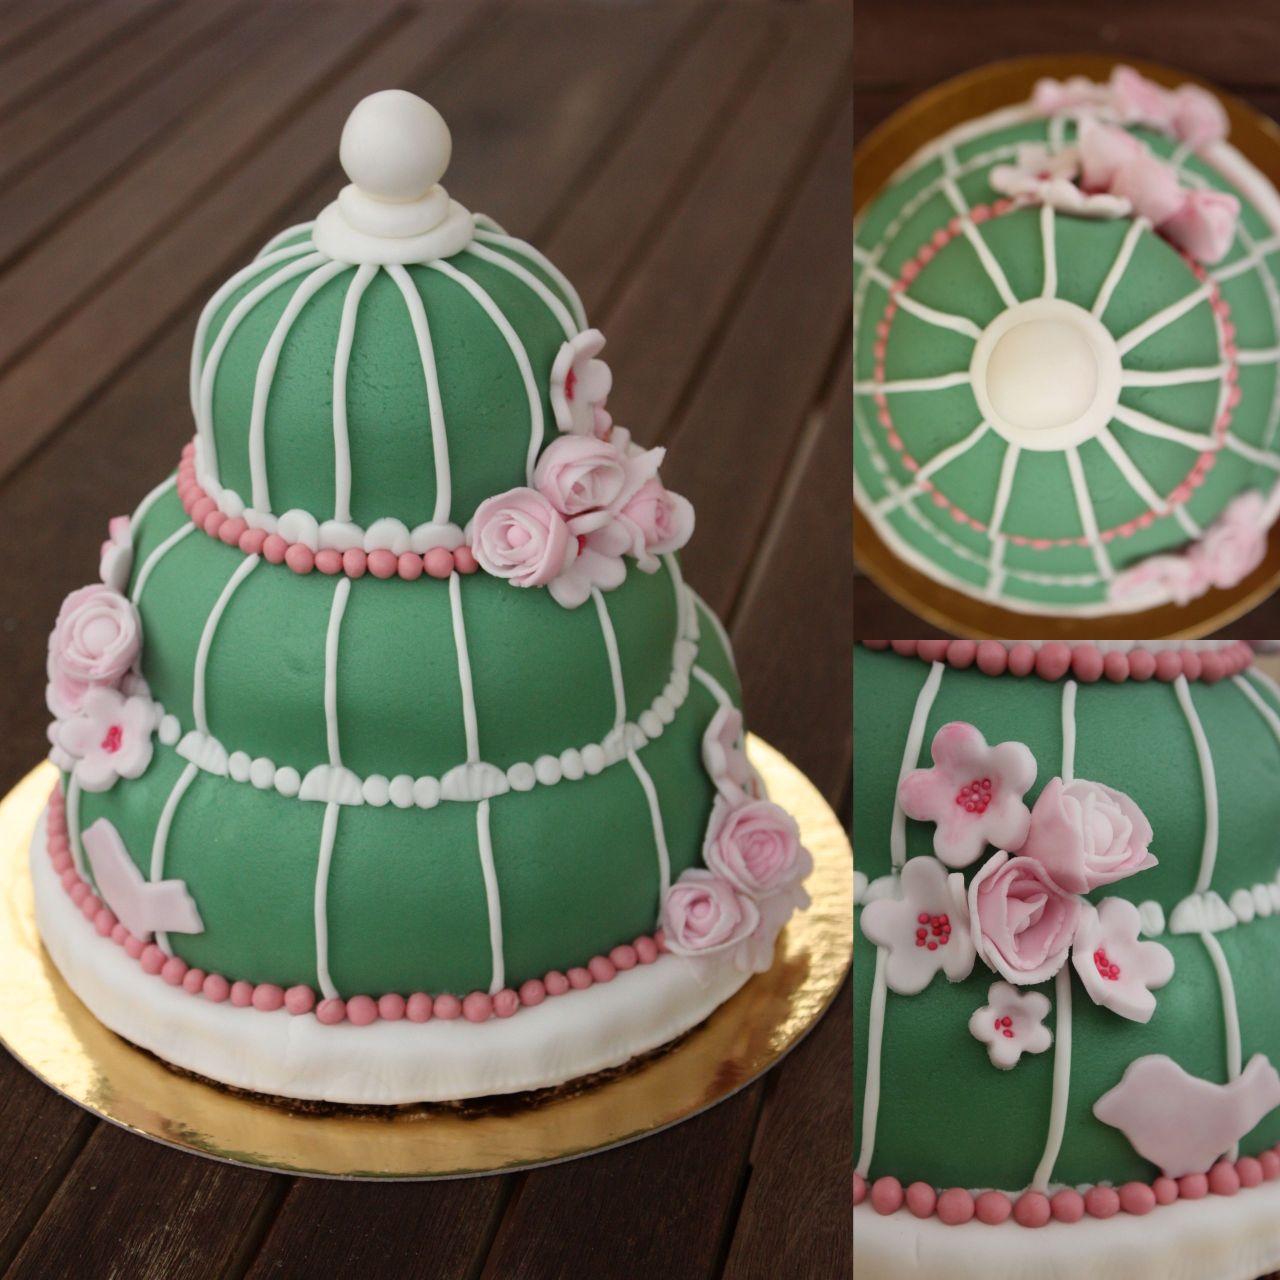 Kalitka torta.jpg